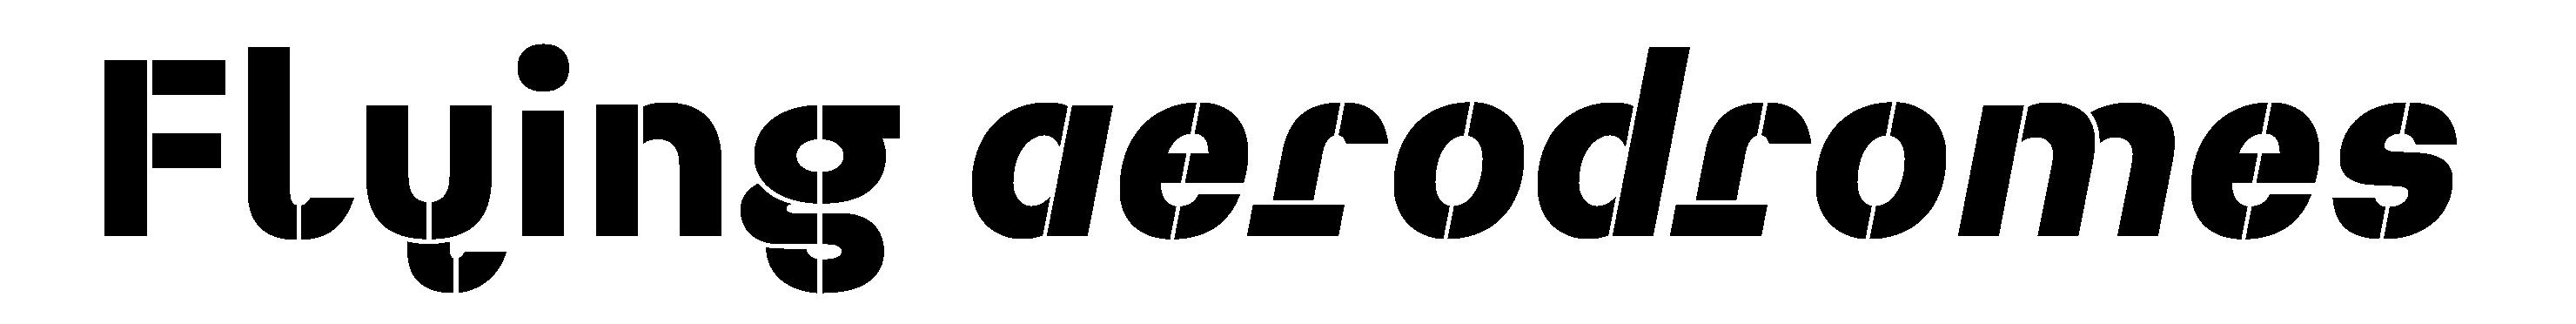 Typeface Heimat Stencil D06 Atlas Font Foundry